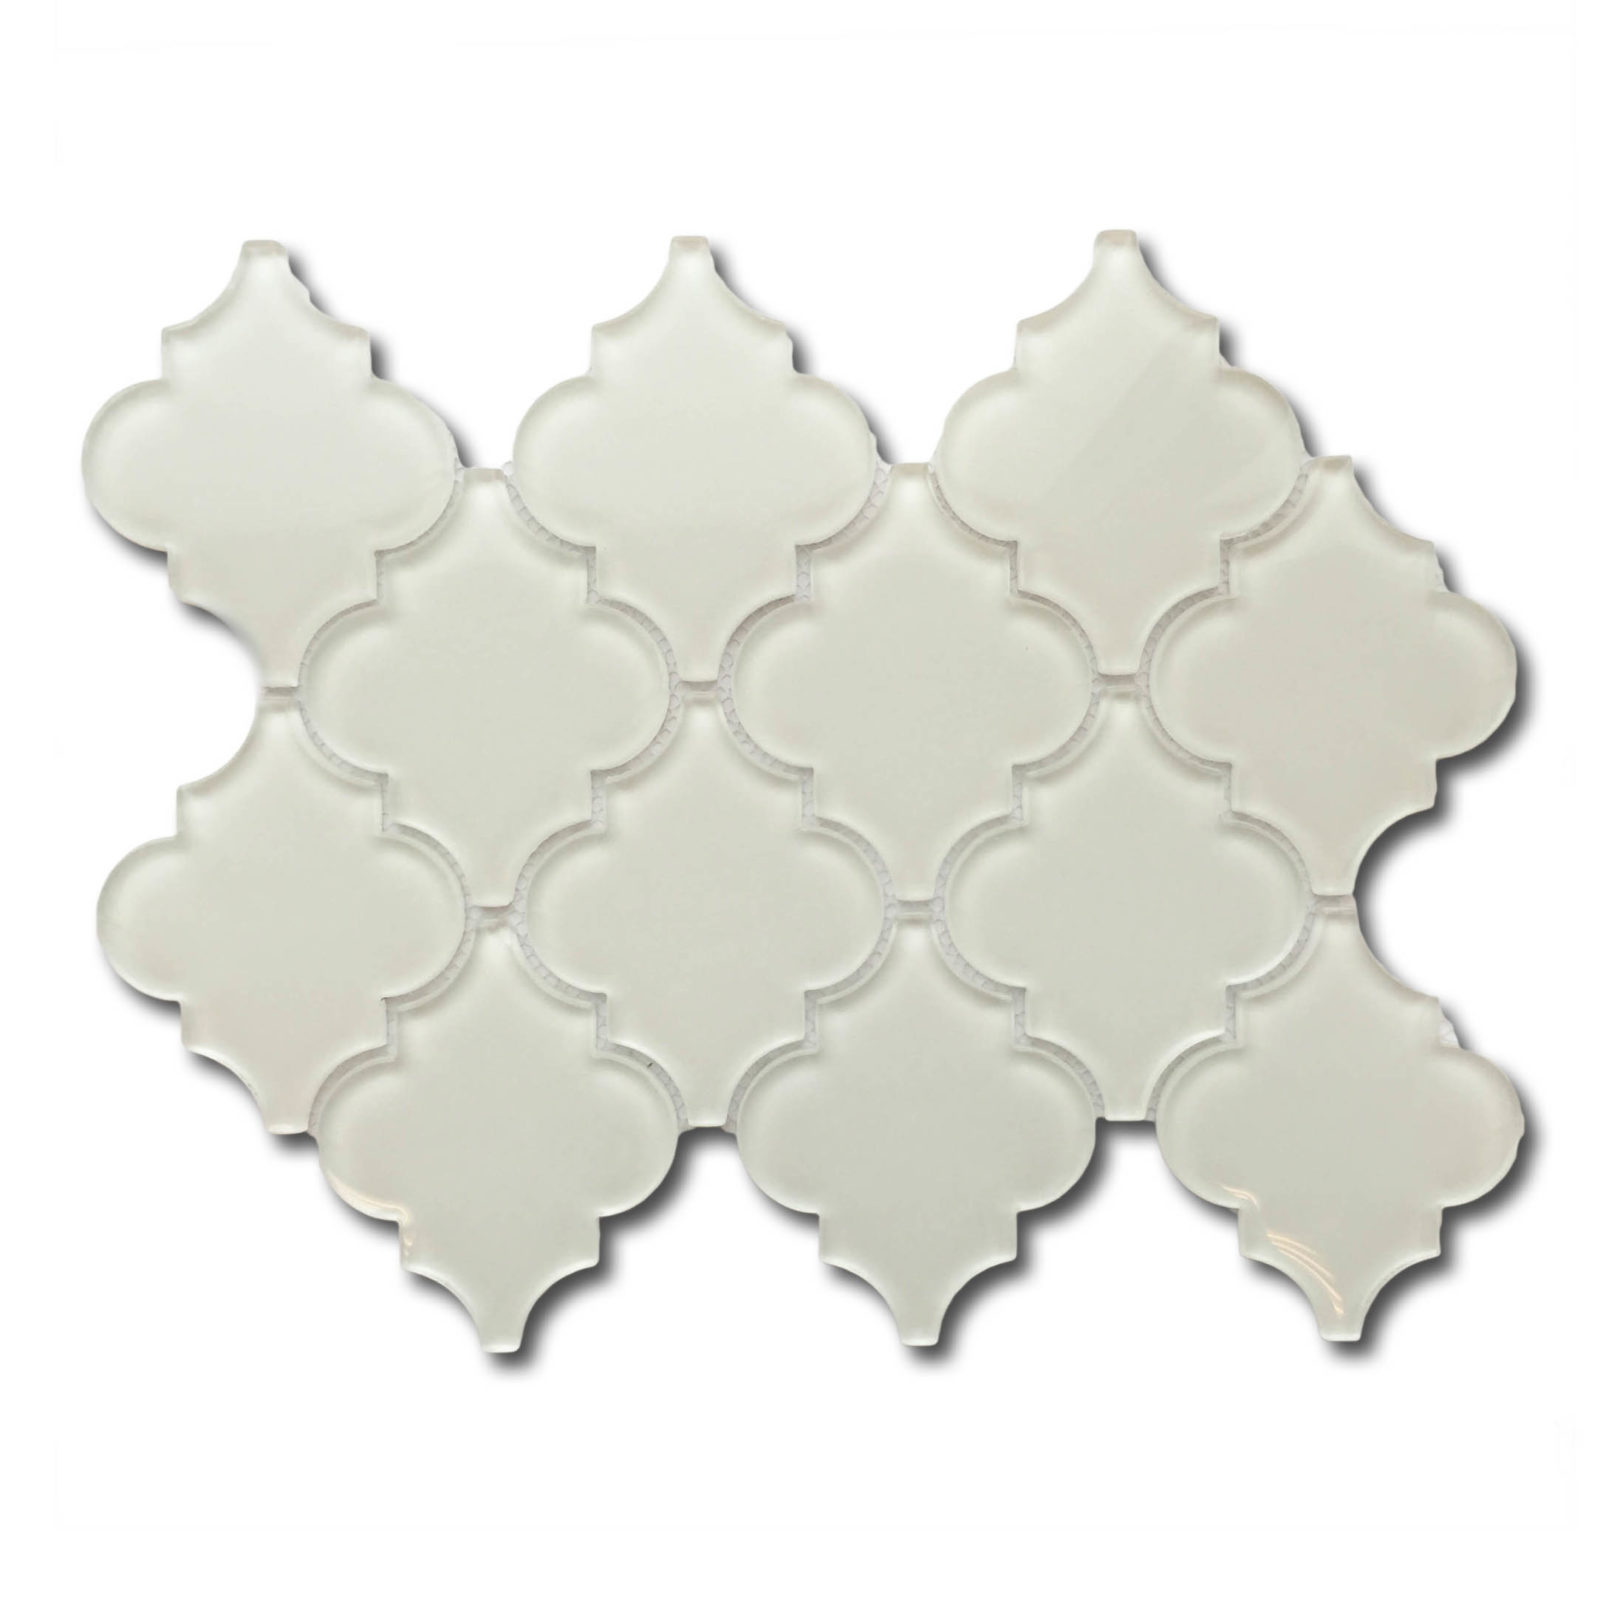 Lantern glass mosaic backsplash